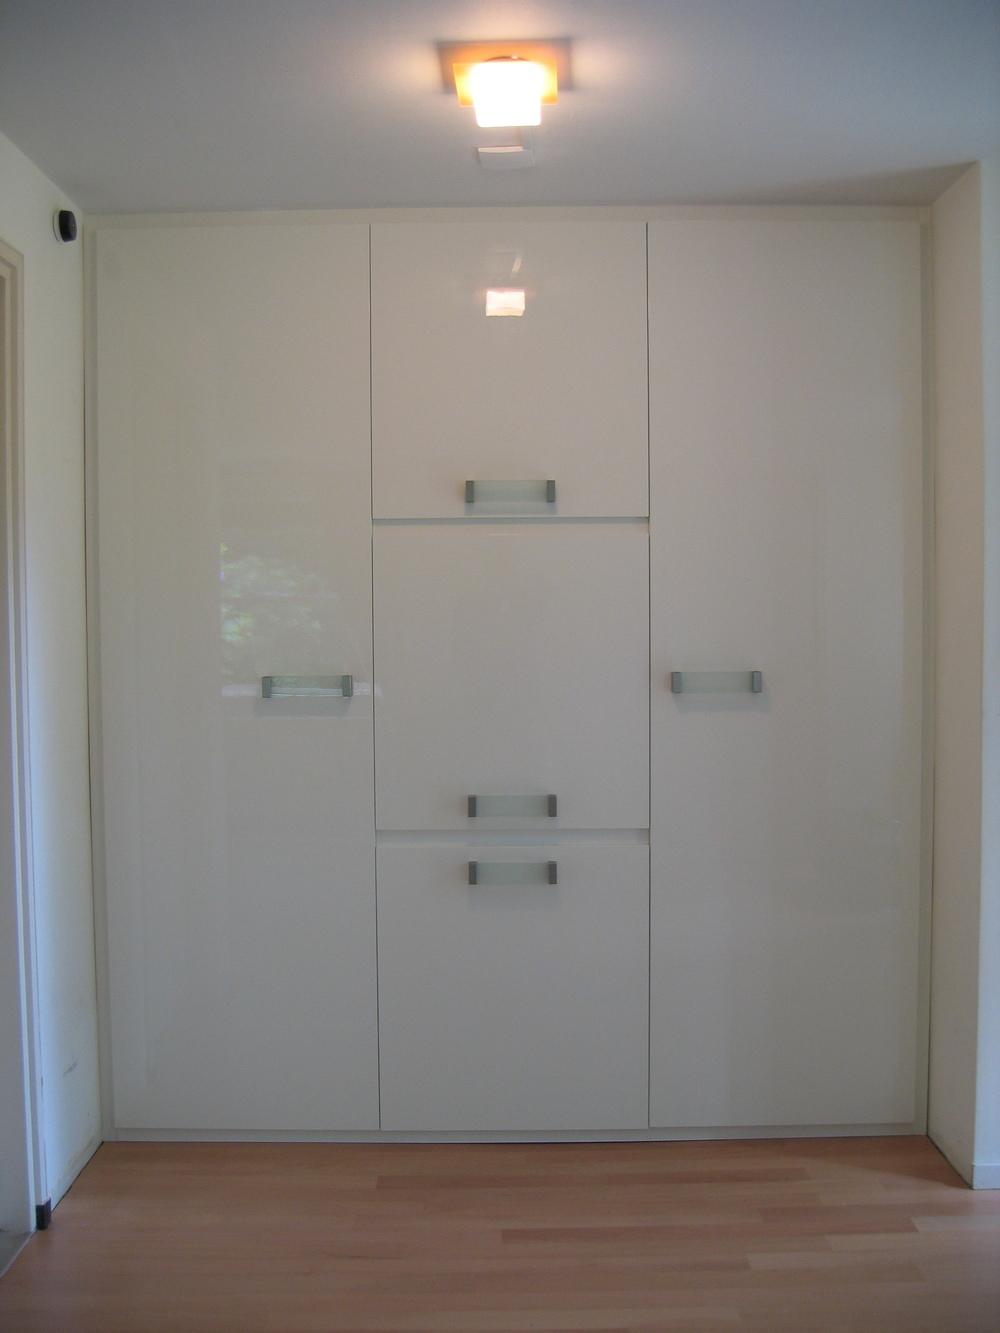 hang-/legkast in hoogglans wit gespoten mdf